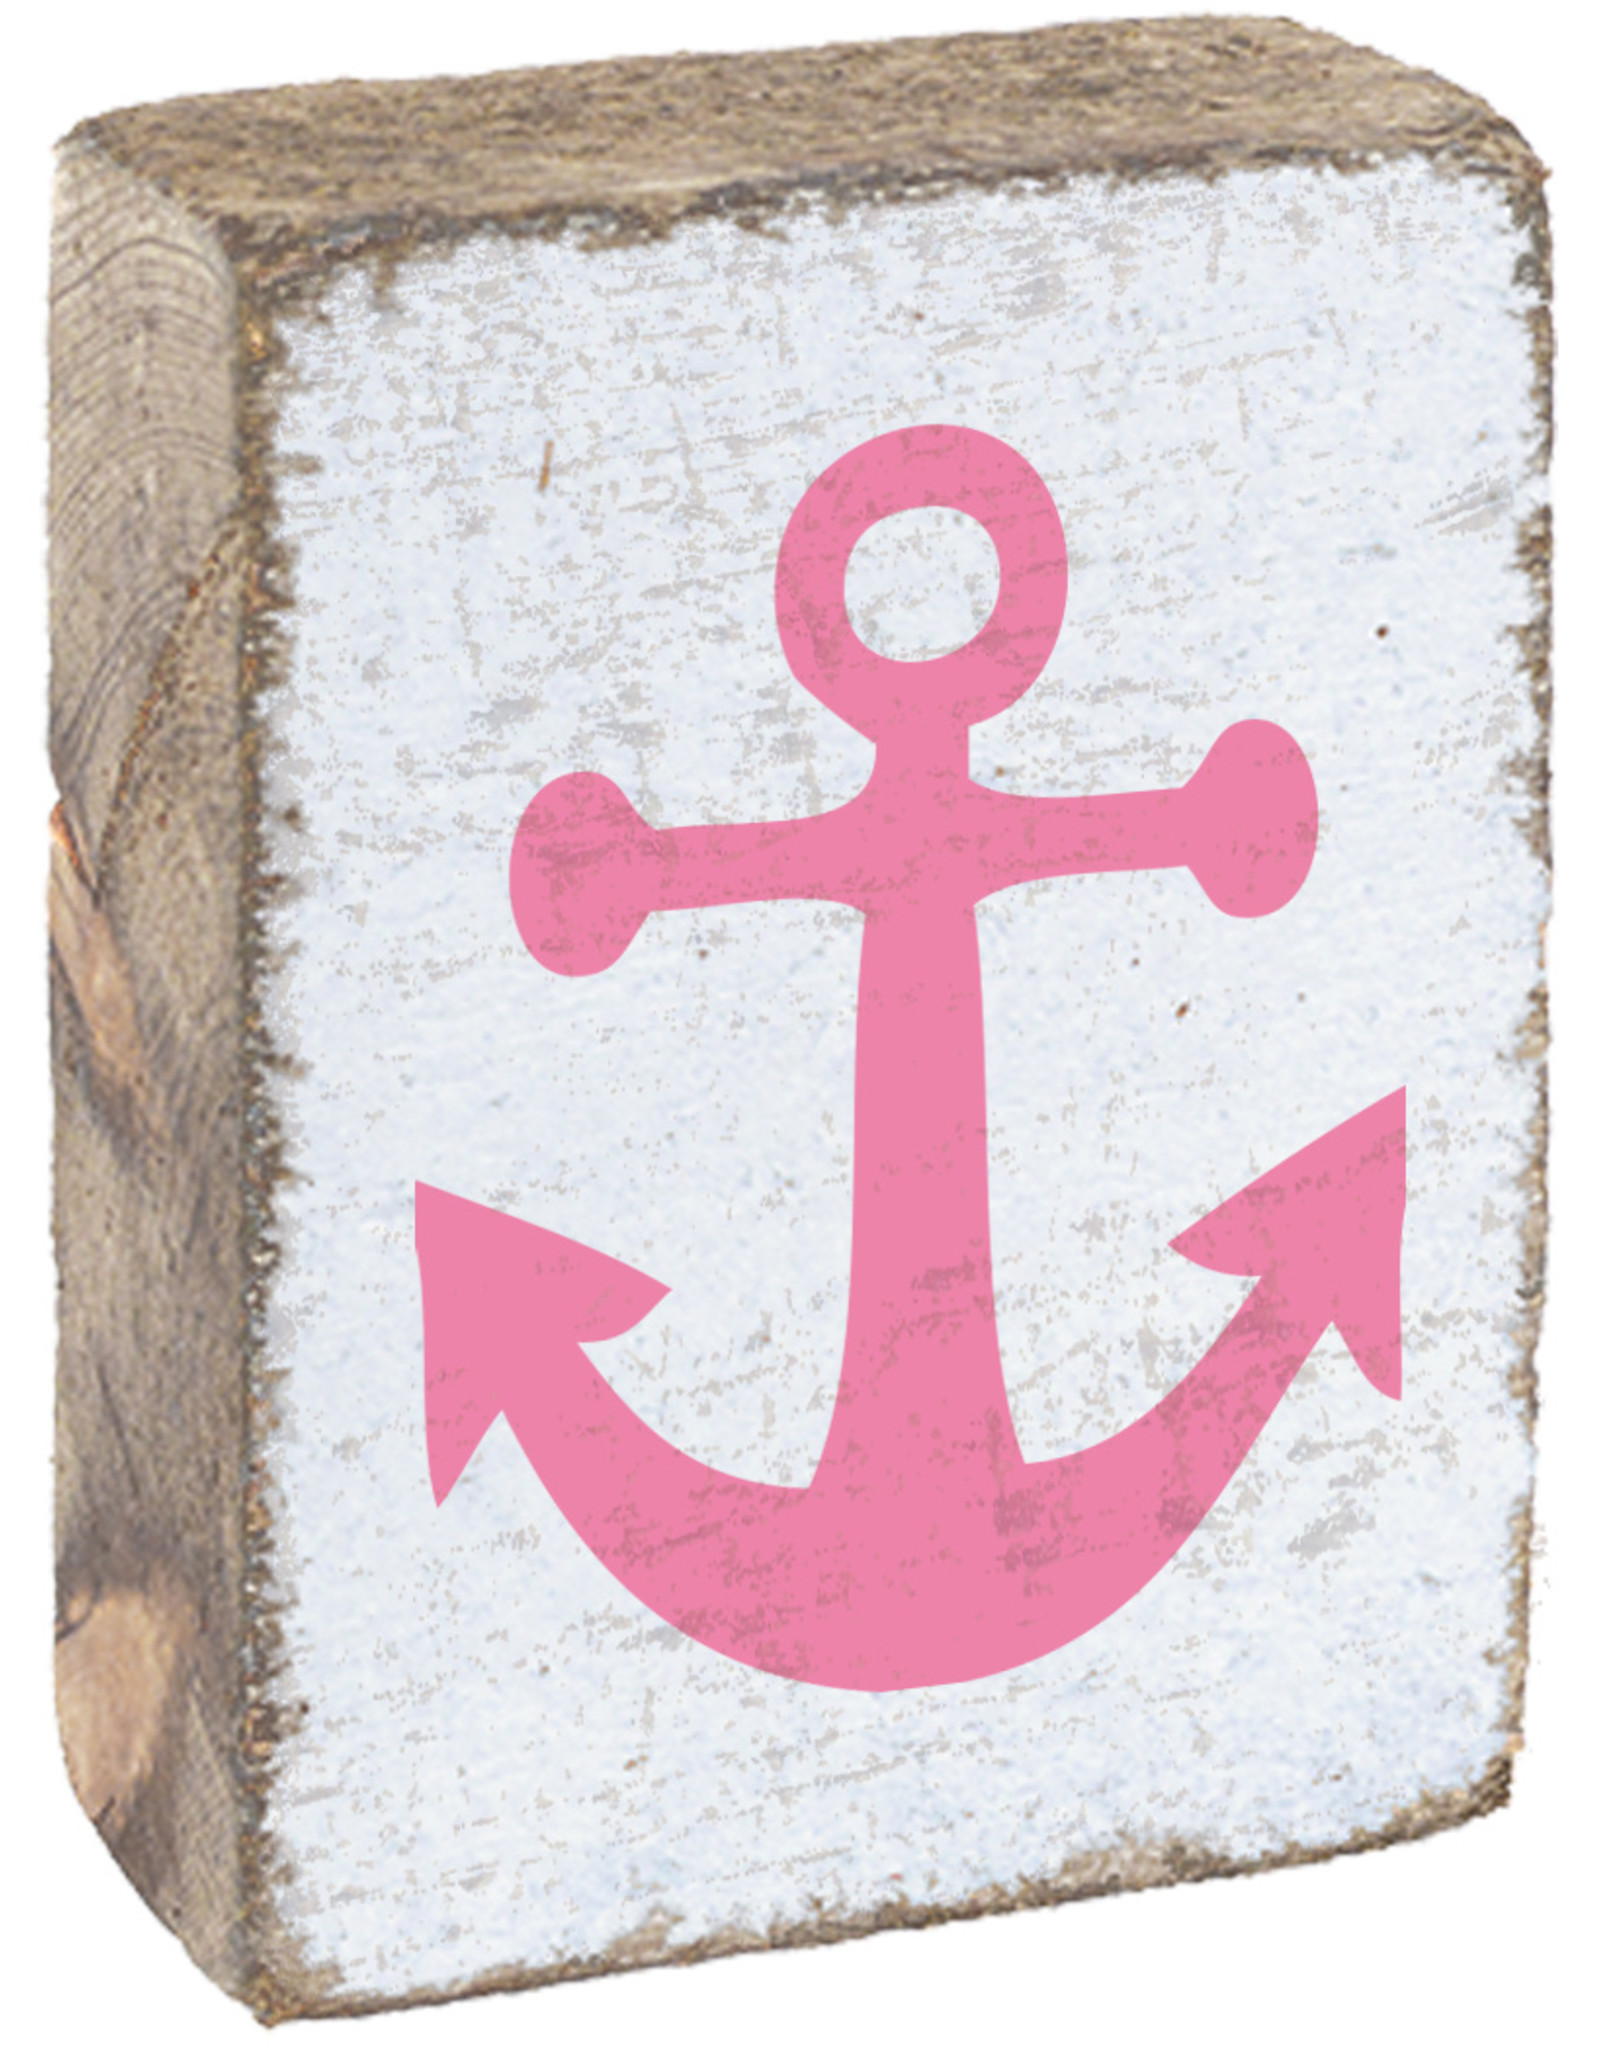 Rustic Marlin Rustic Marlin - Symbol Blocks Anchor - Pink